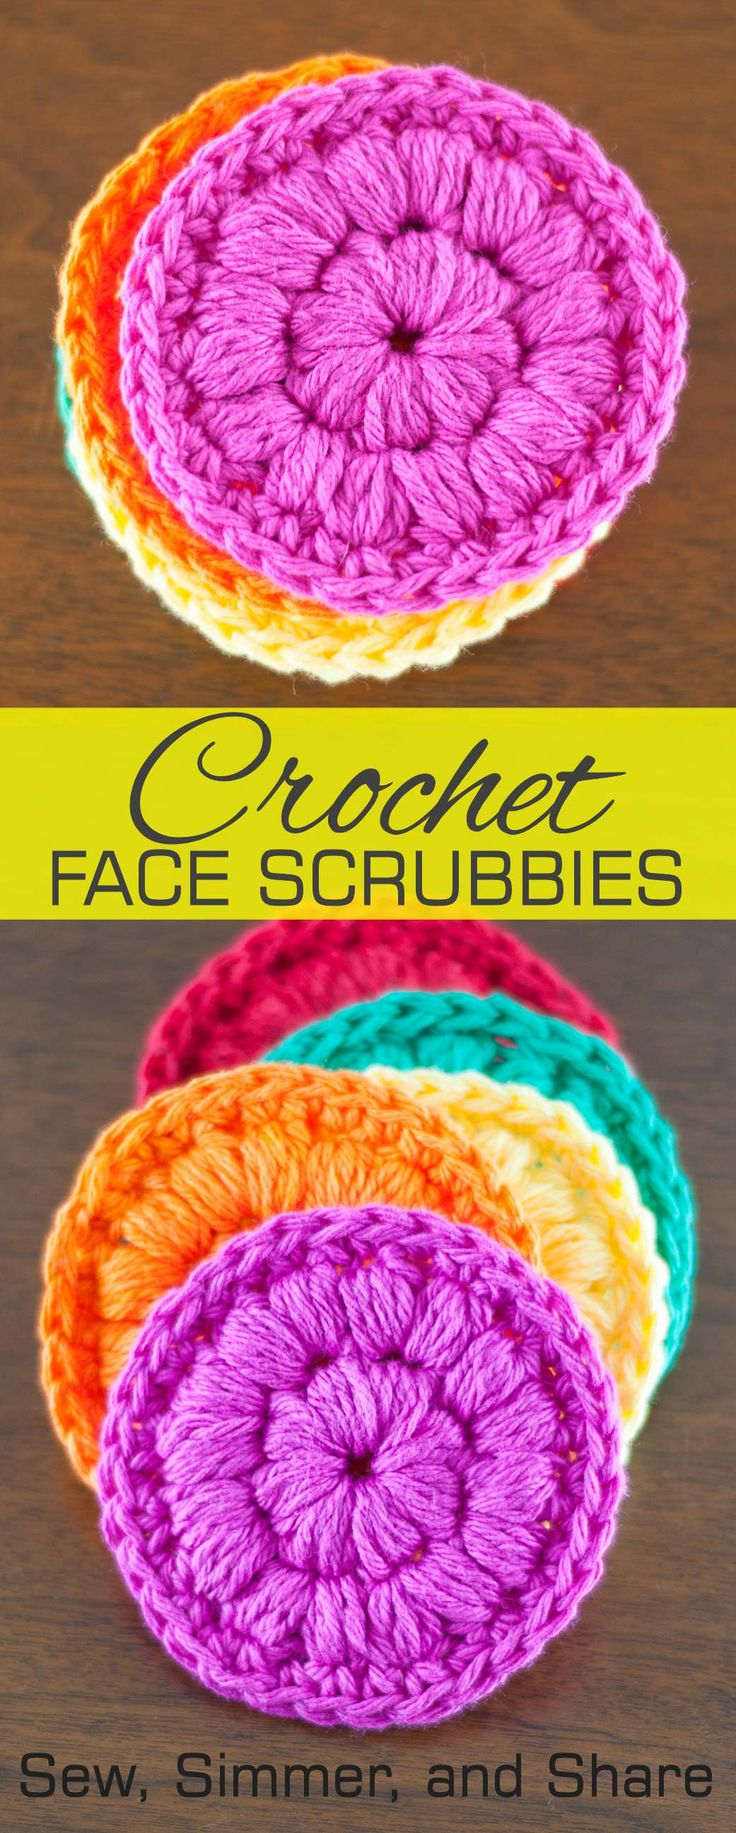 #Crochet Face Scrubbies | SewSimmerAndShare.com #freepattern, plus how to puff stitch!